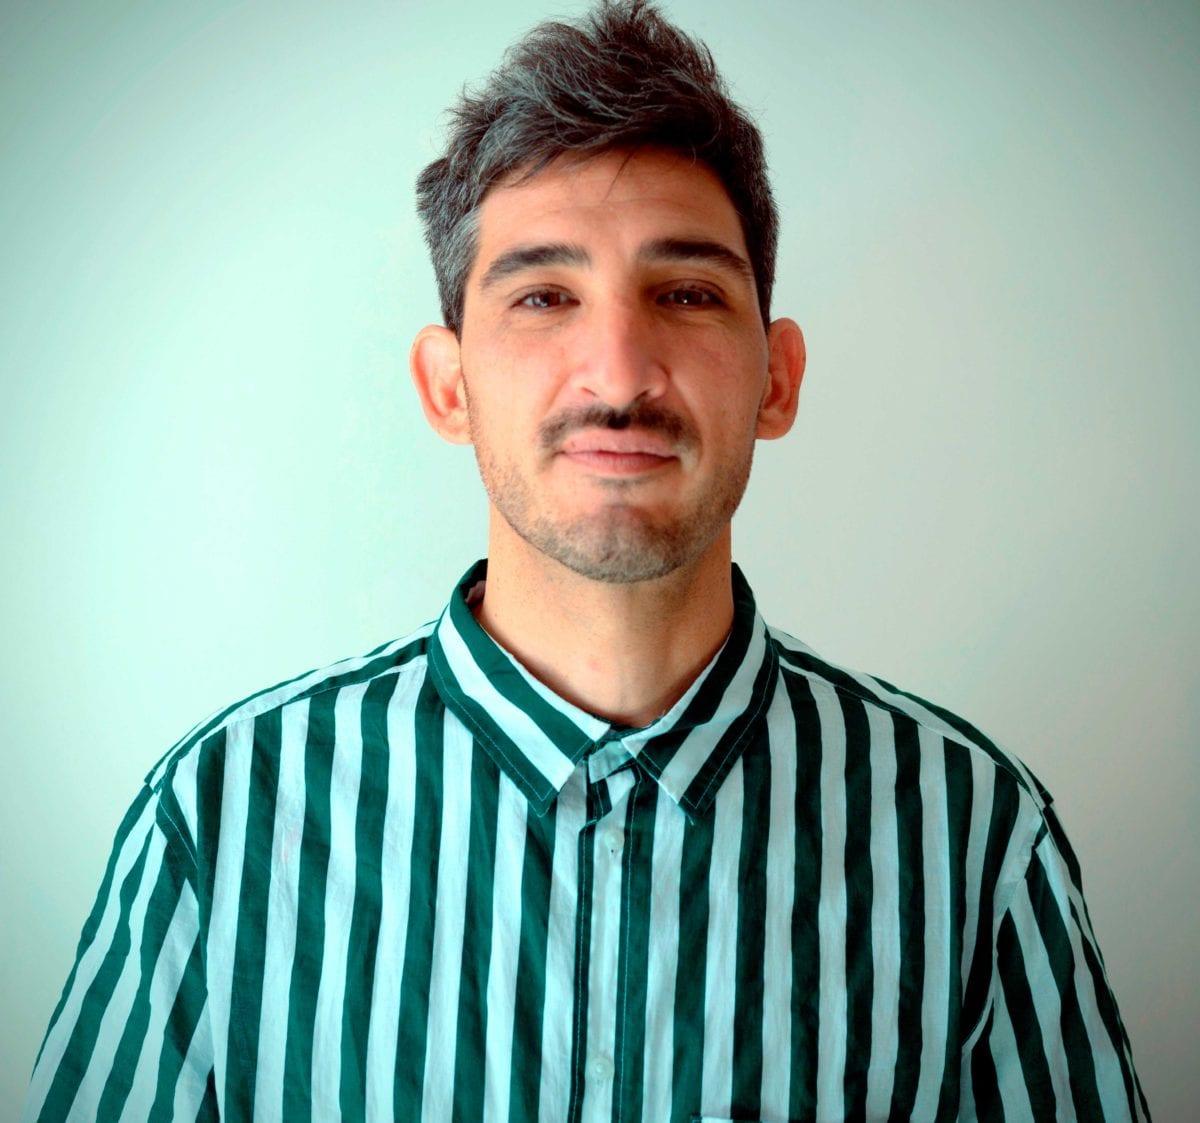 Diego Galarza Marmissolle